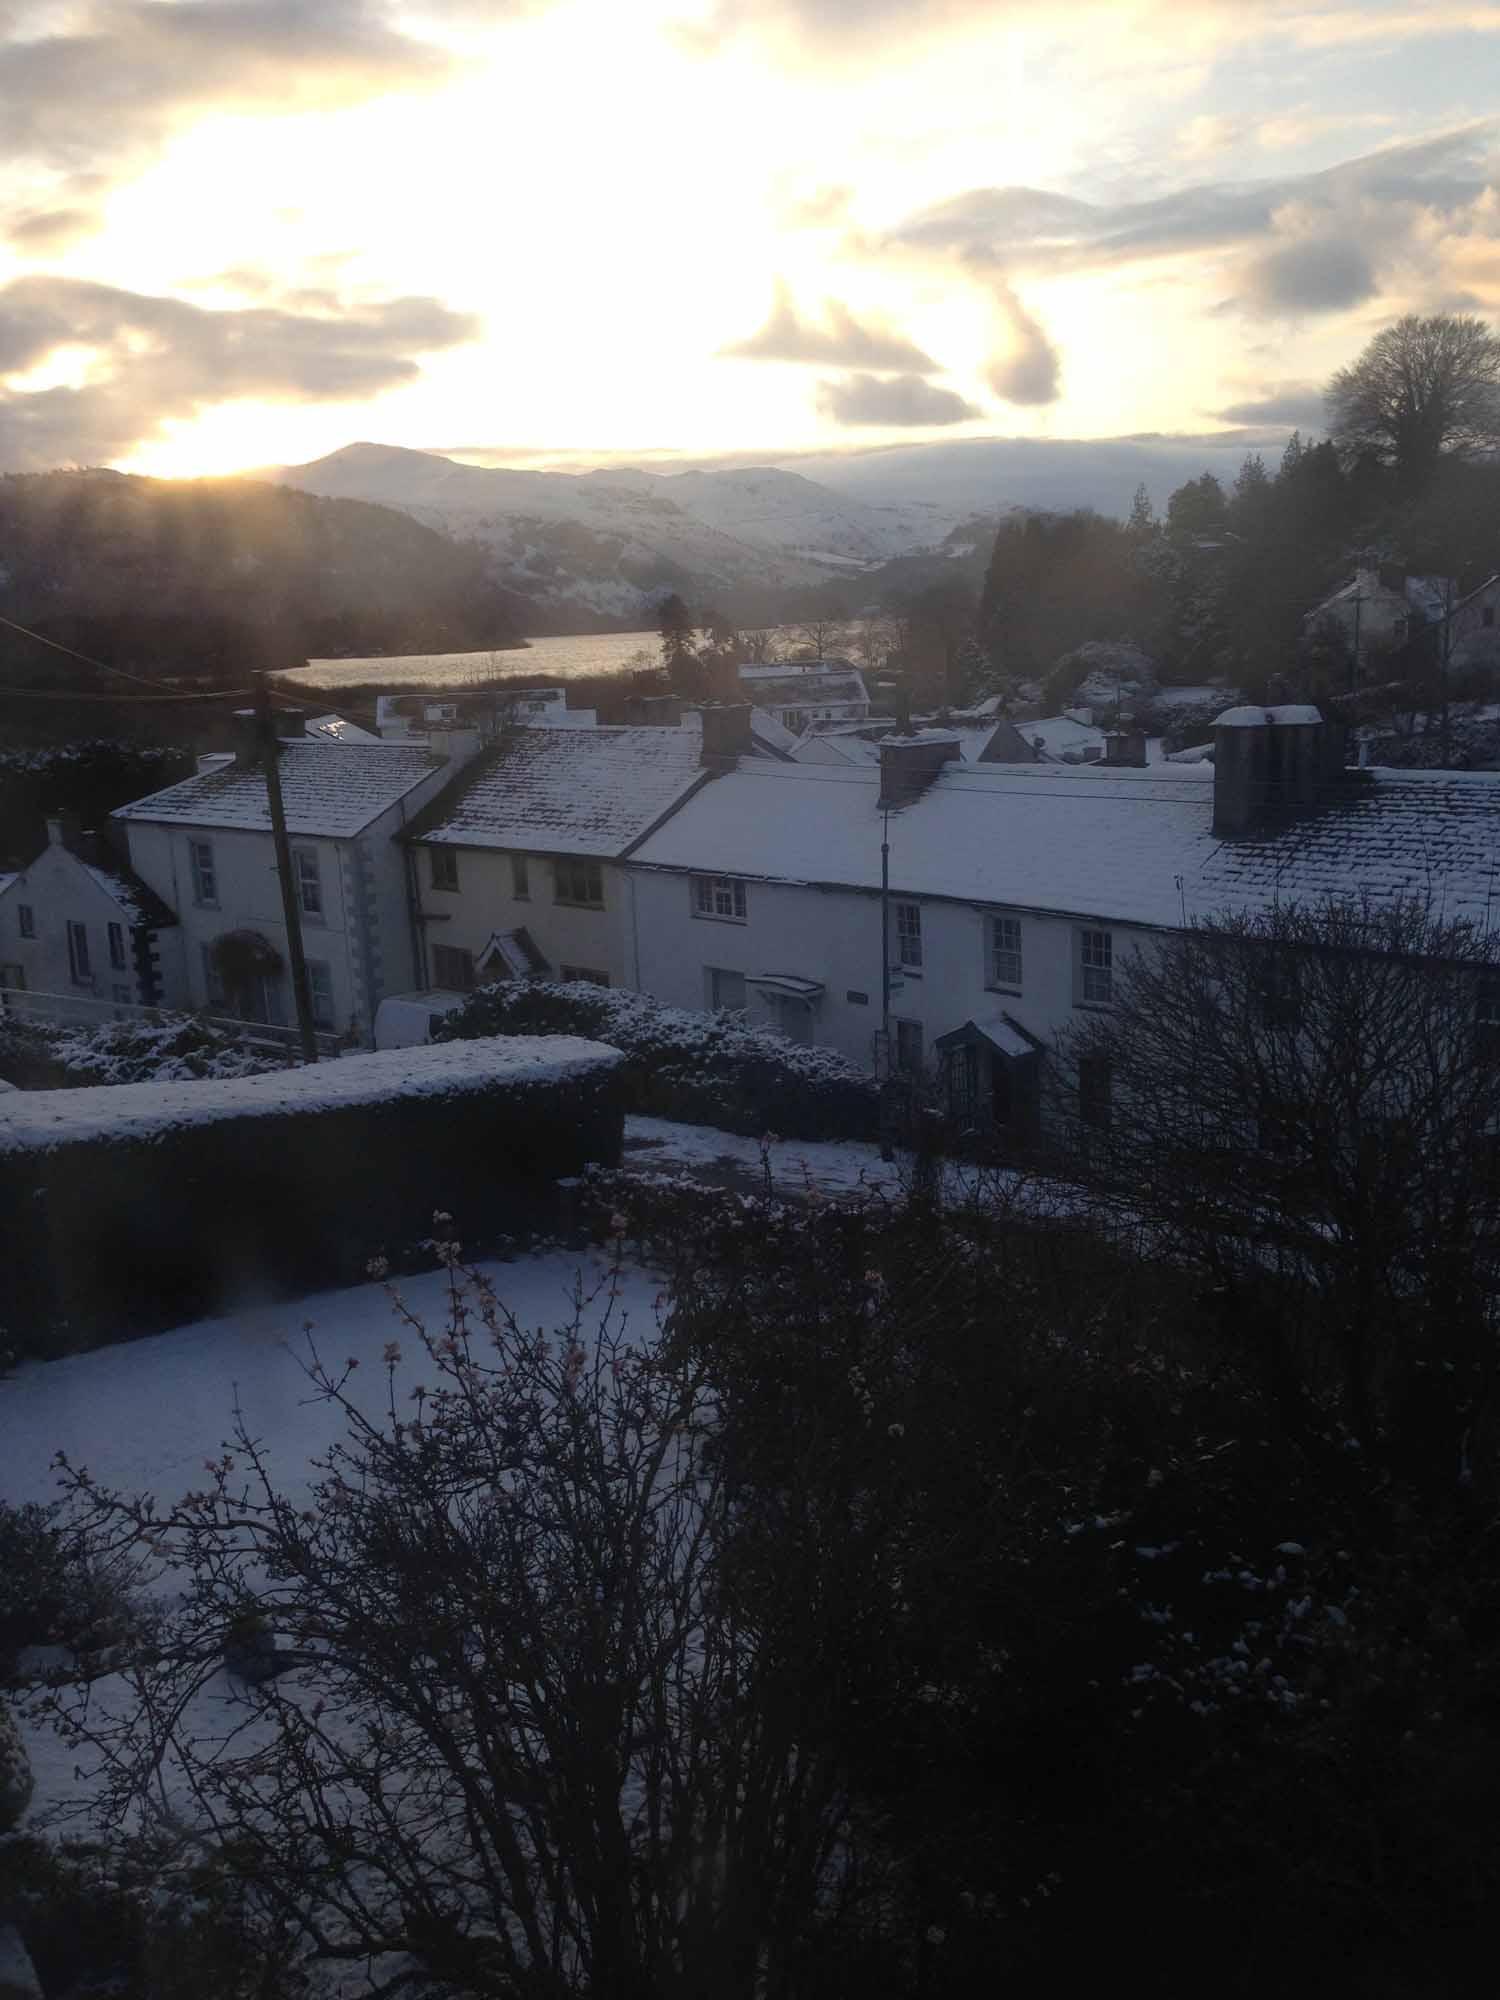 snow_view_derwentwater_view_from_room_3.jpg